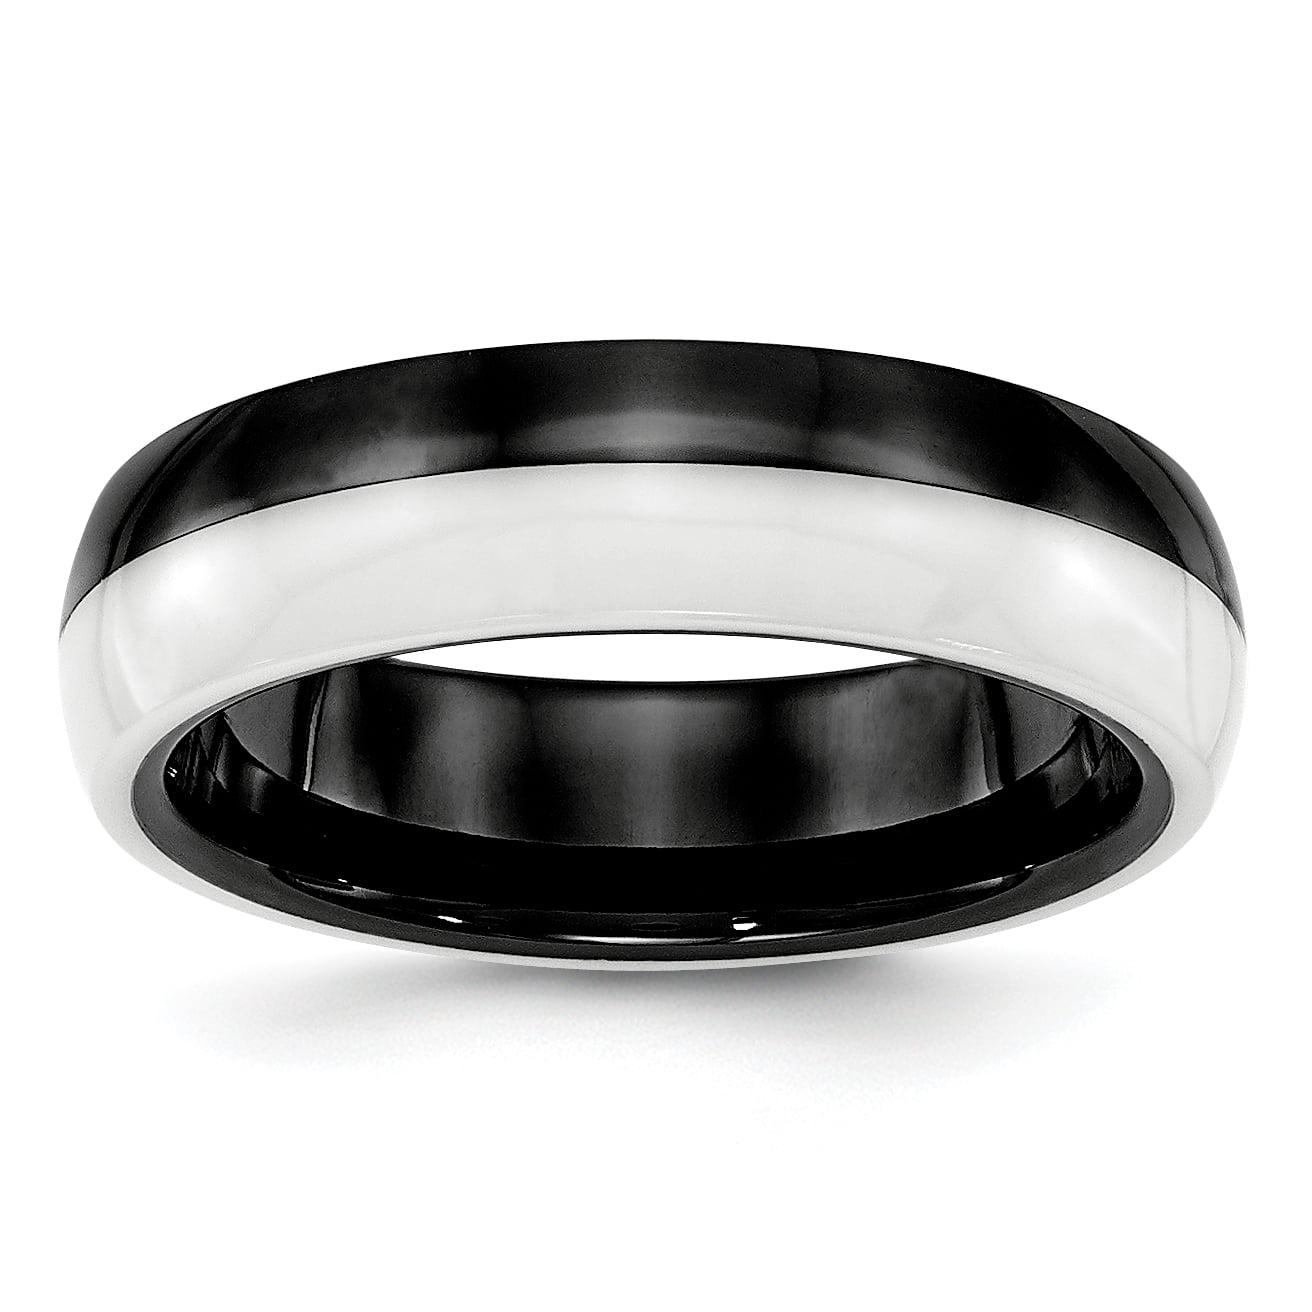 Bridal Wedding Bands Decorative Bands Ceramic Black and White 6.00mm Band Size 7.5